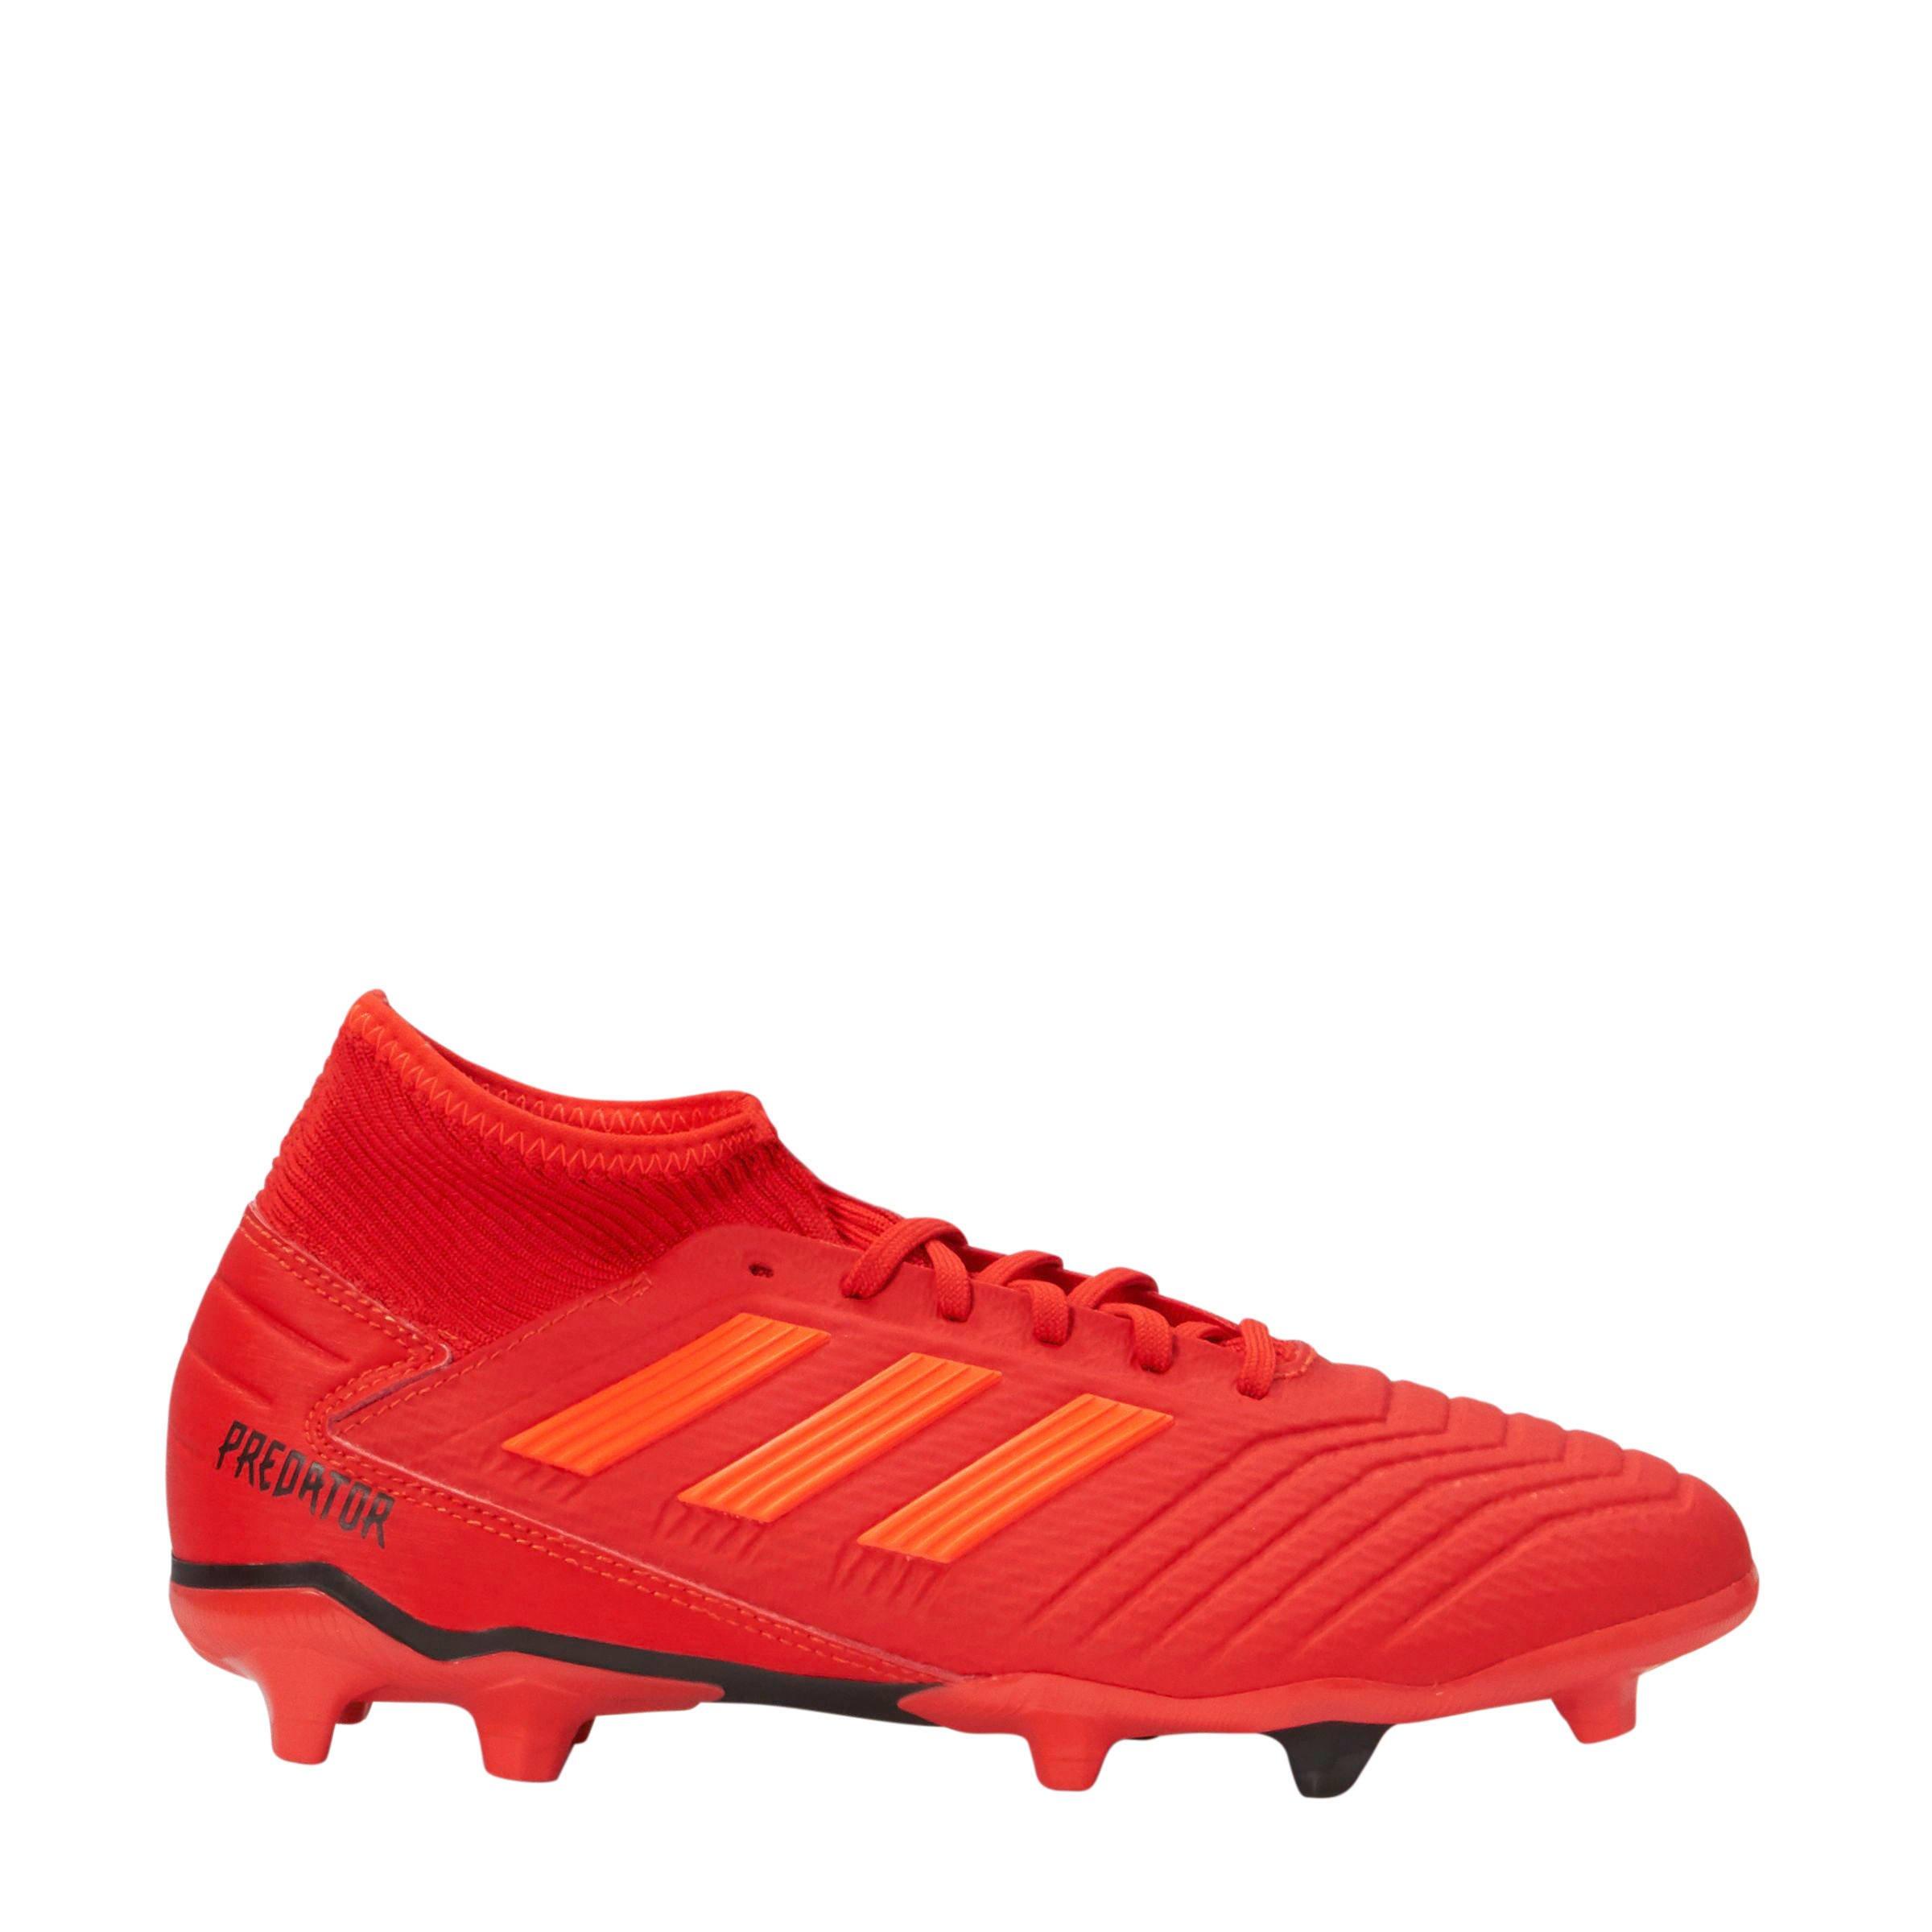 e9ea79c5b15 adidas performance Predator 19.3 FG voetbalschoenen rood   wehkamp